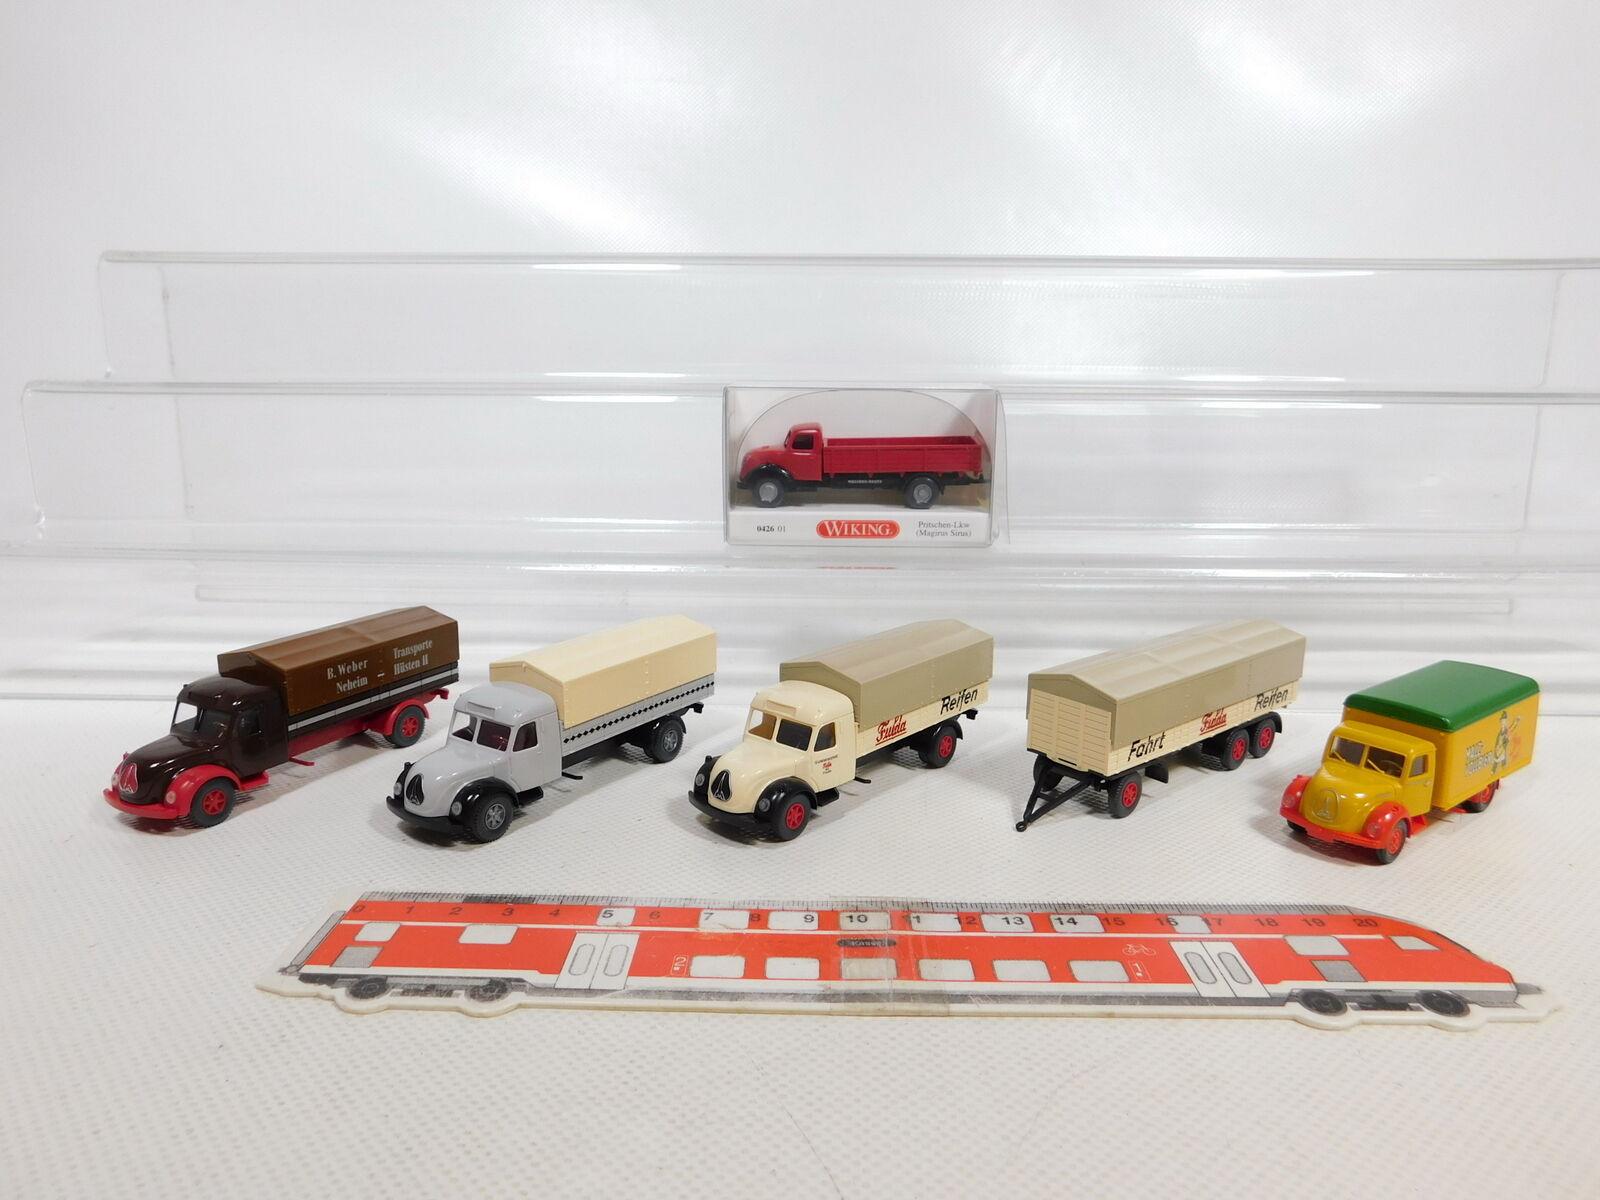 Ca537-0, 5  5x Wiking 1 87 h0 camión Magirus  0426 + Fulda + Malta-llena de cerveza etc, S.G.